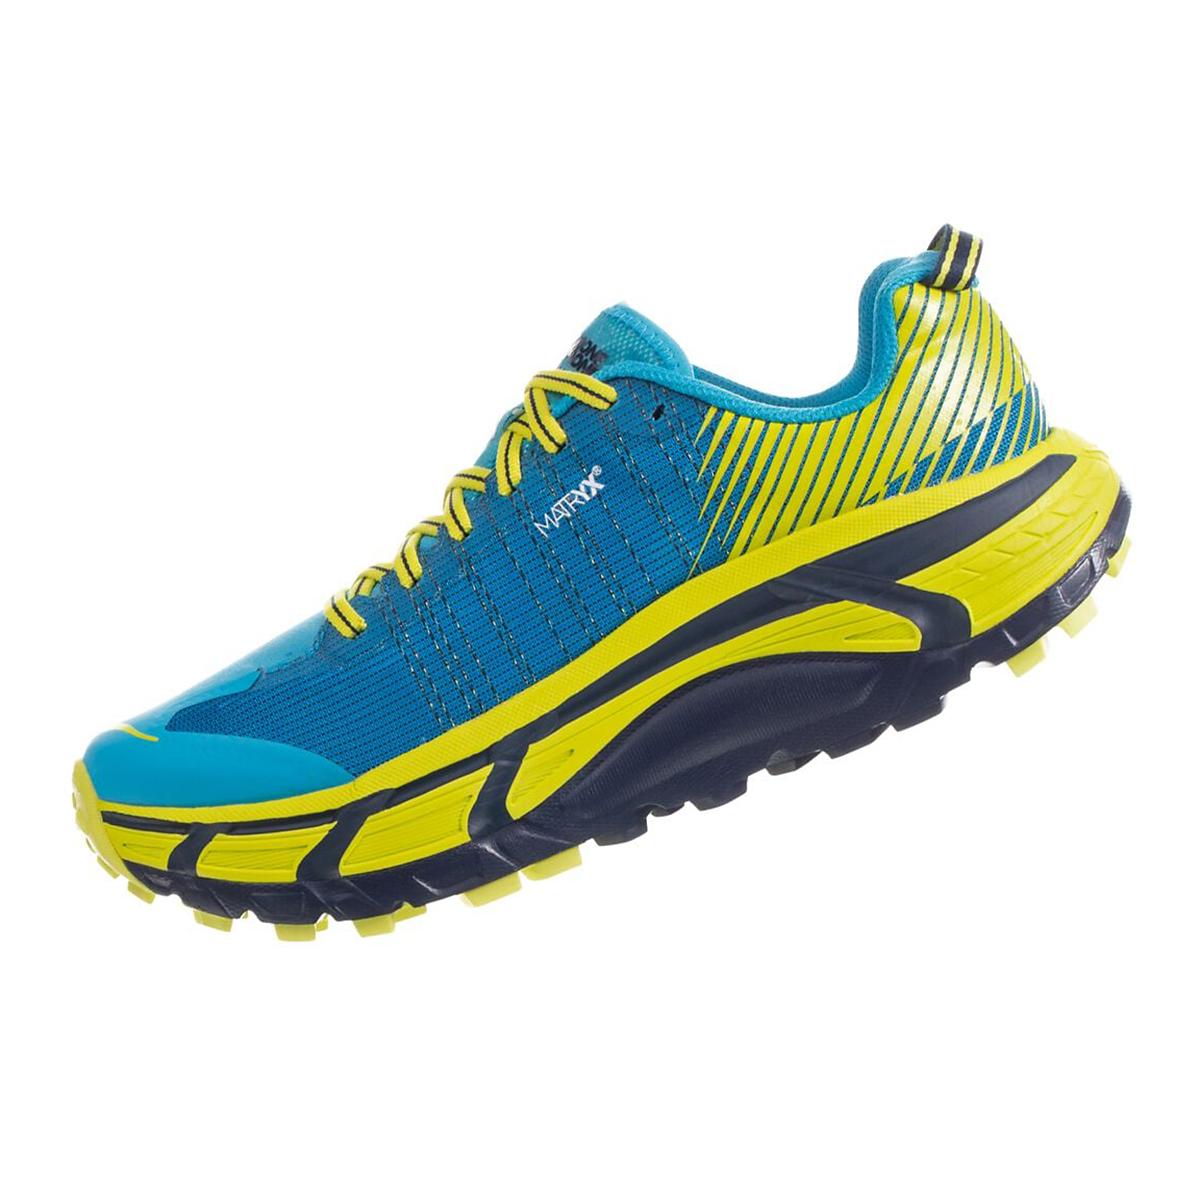 Men's Hoka One One Evo Mafate 2 Running Shoe - Color: Cyan/Citrus - Size: 7 - Width: Regular, Cyan/Citrus, large, image 2